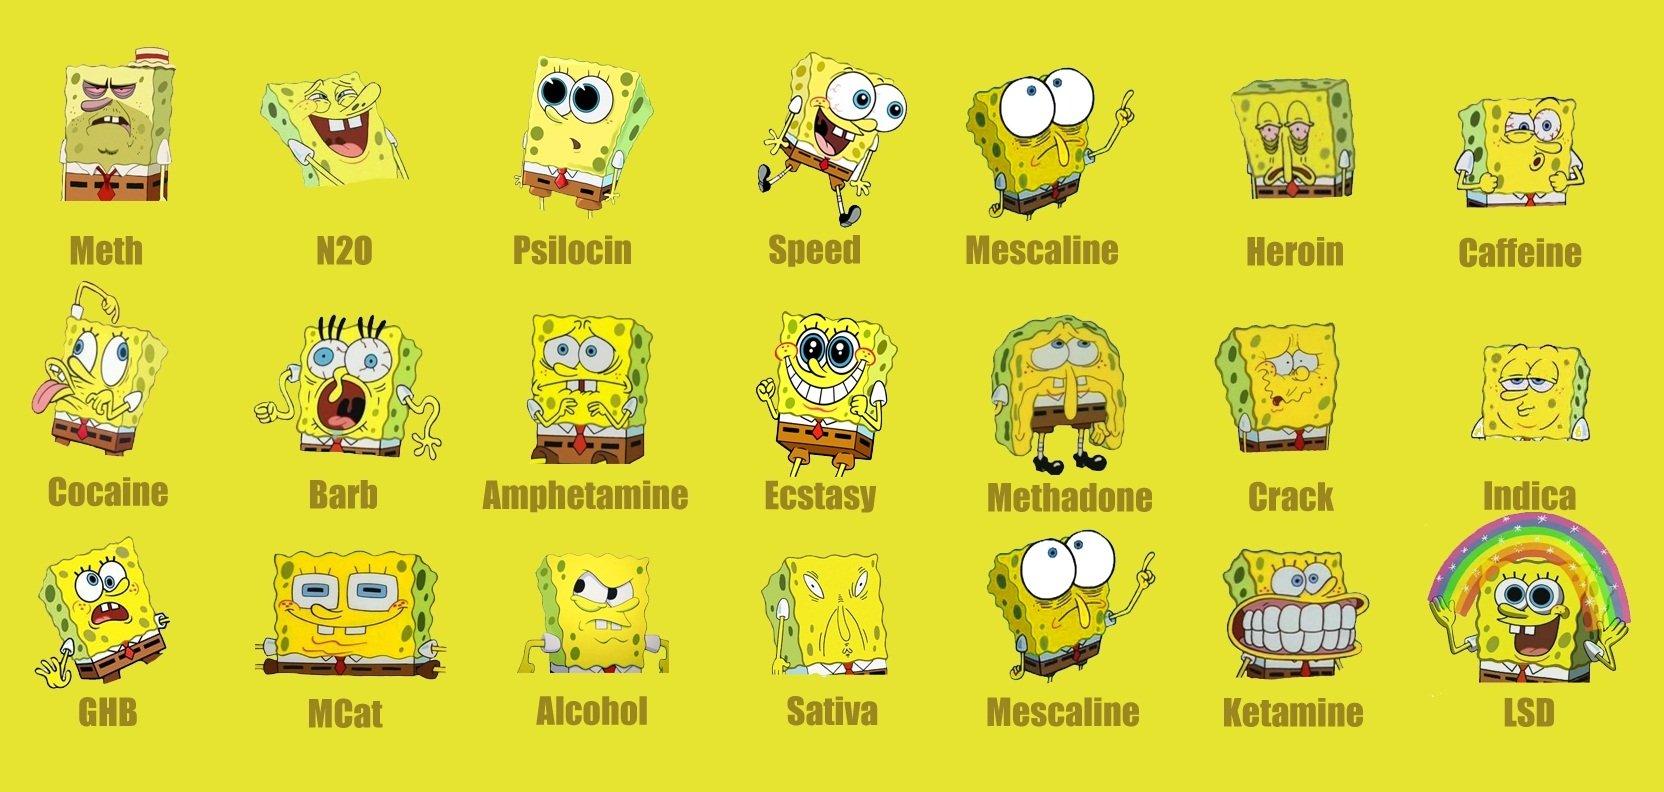 Spongebob drug meme